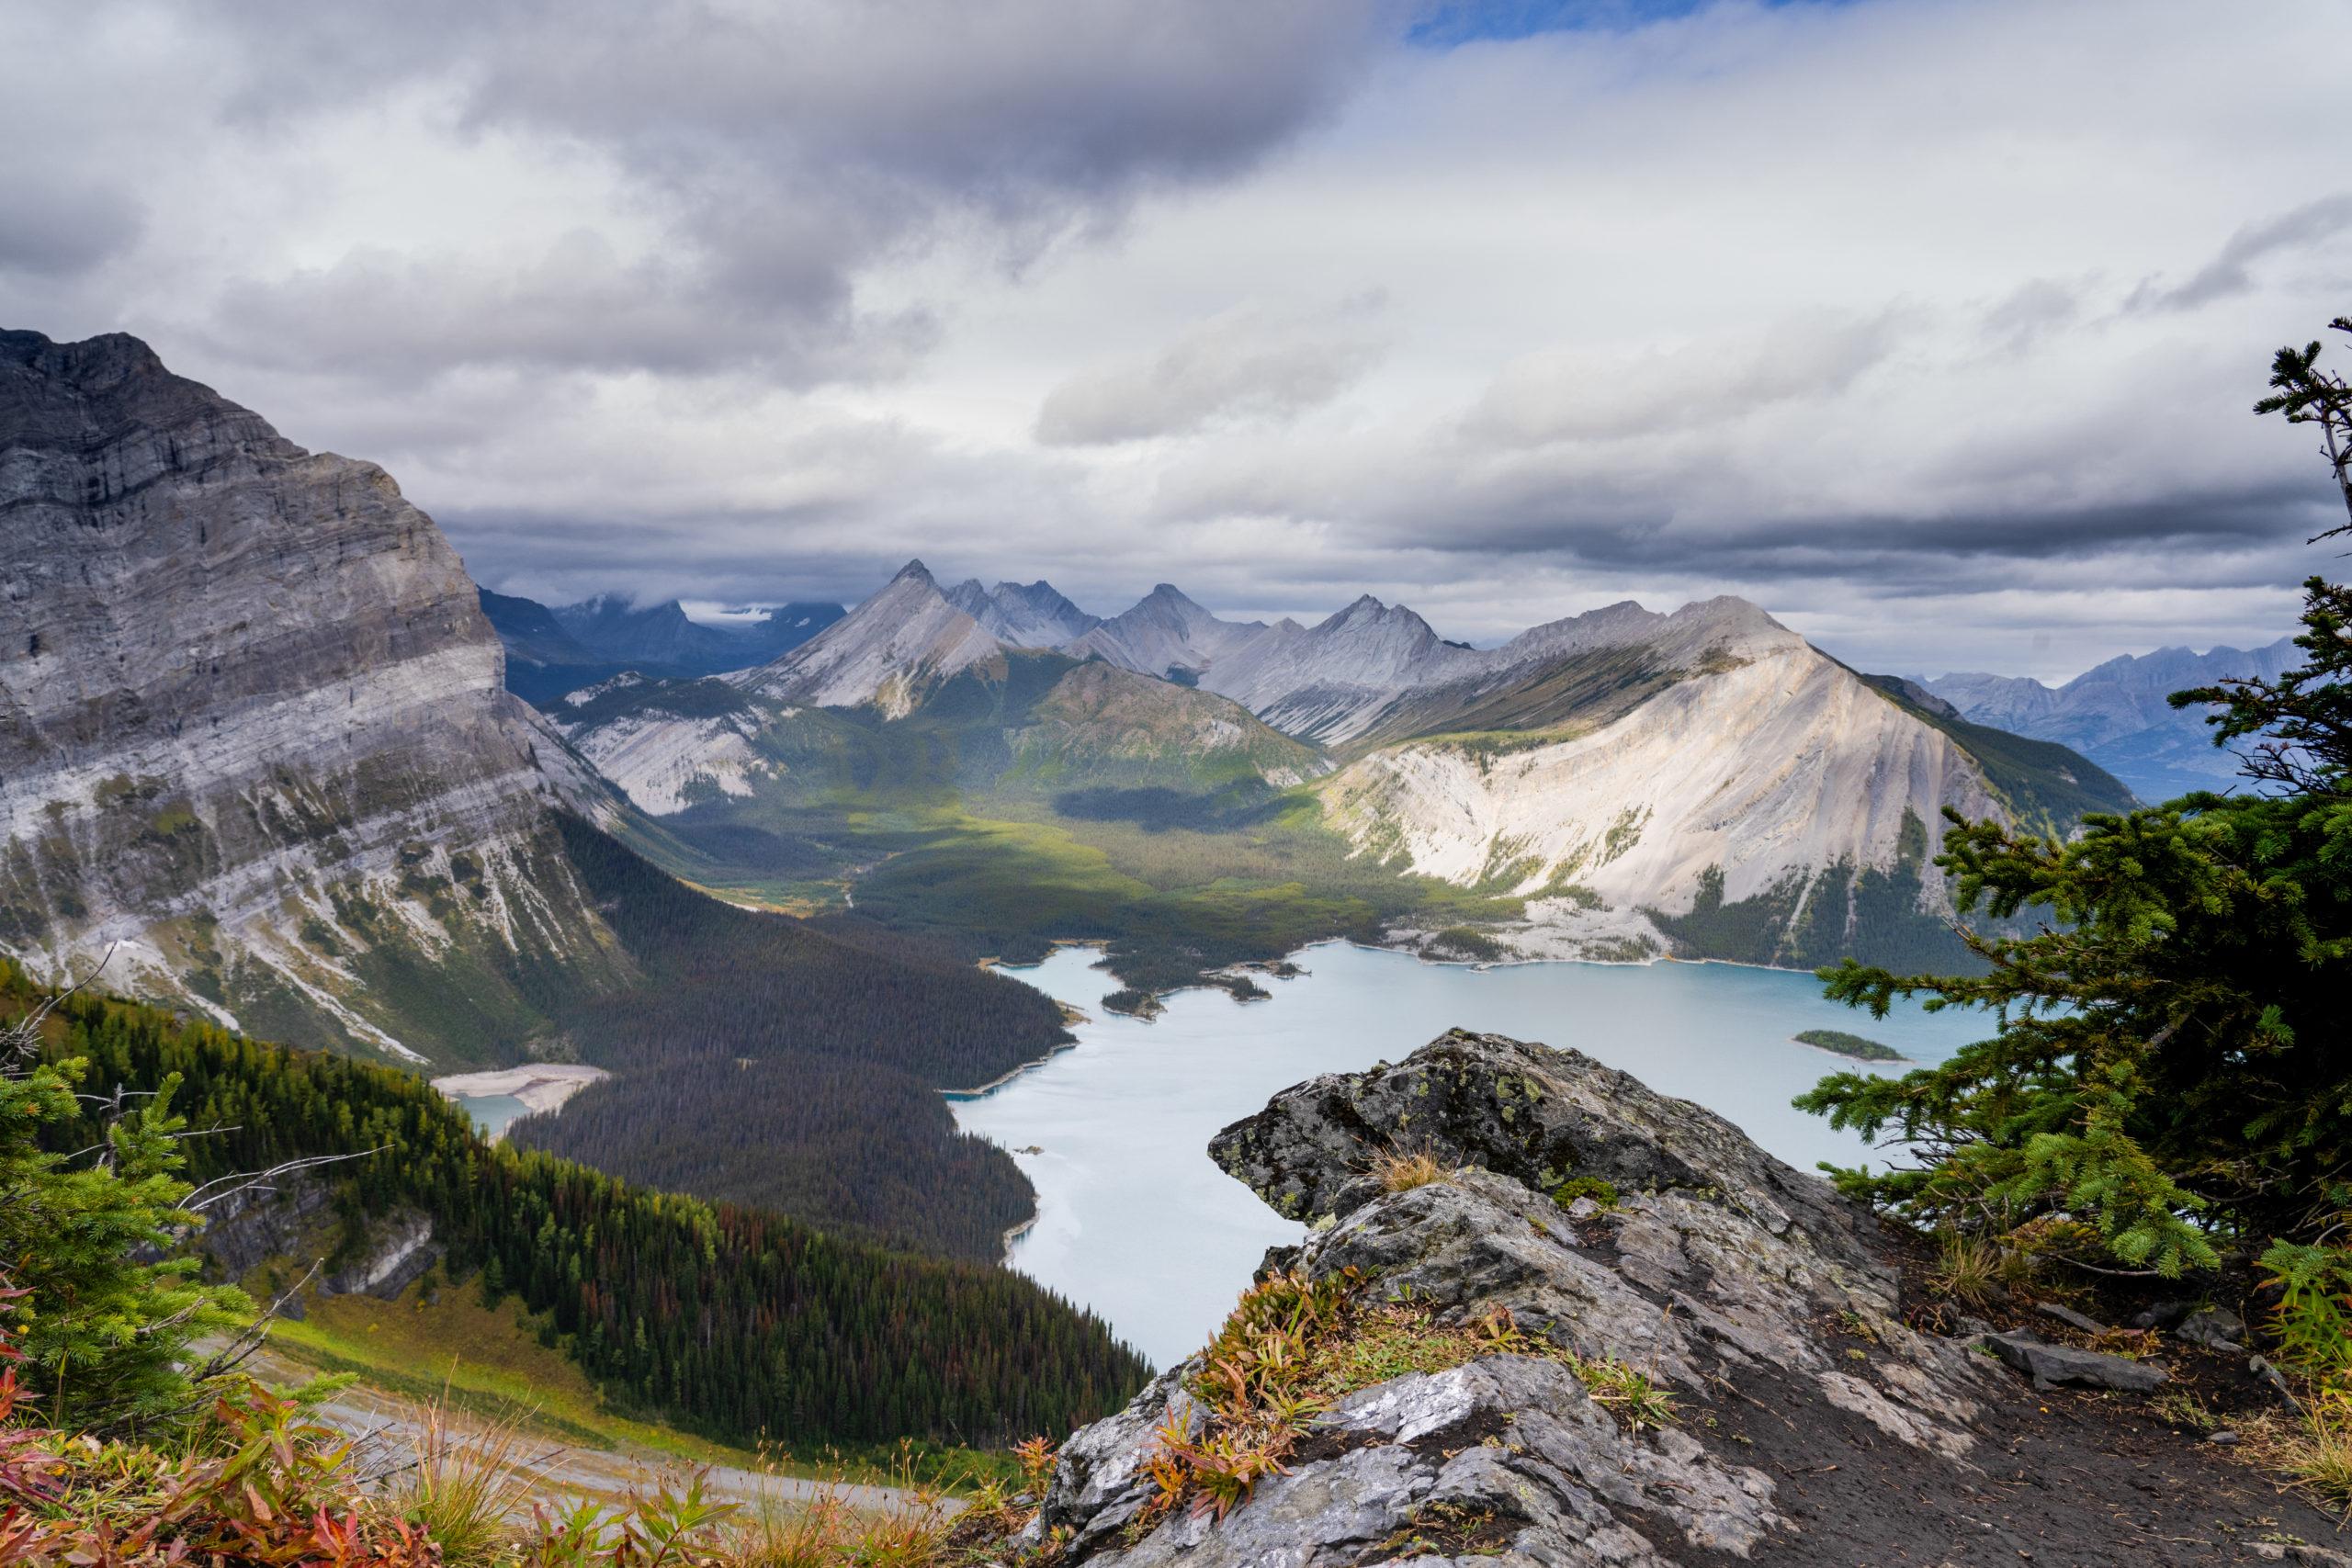 lac_montagne_banff_canada_paysage_rocheuses_alberta